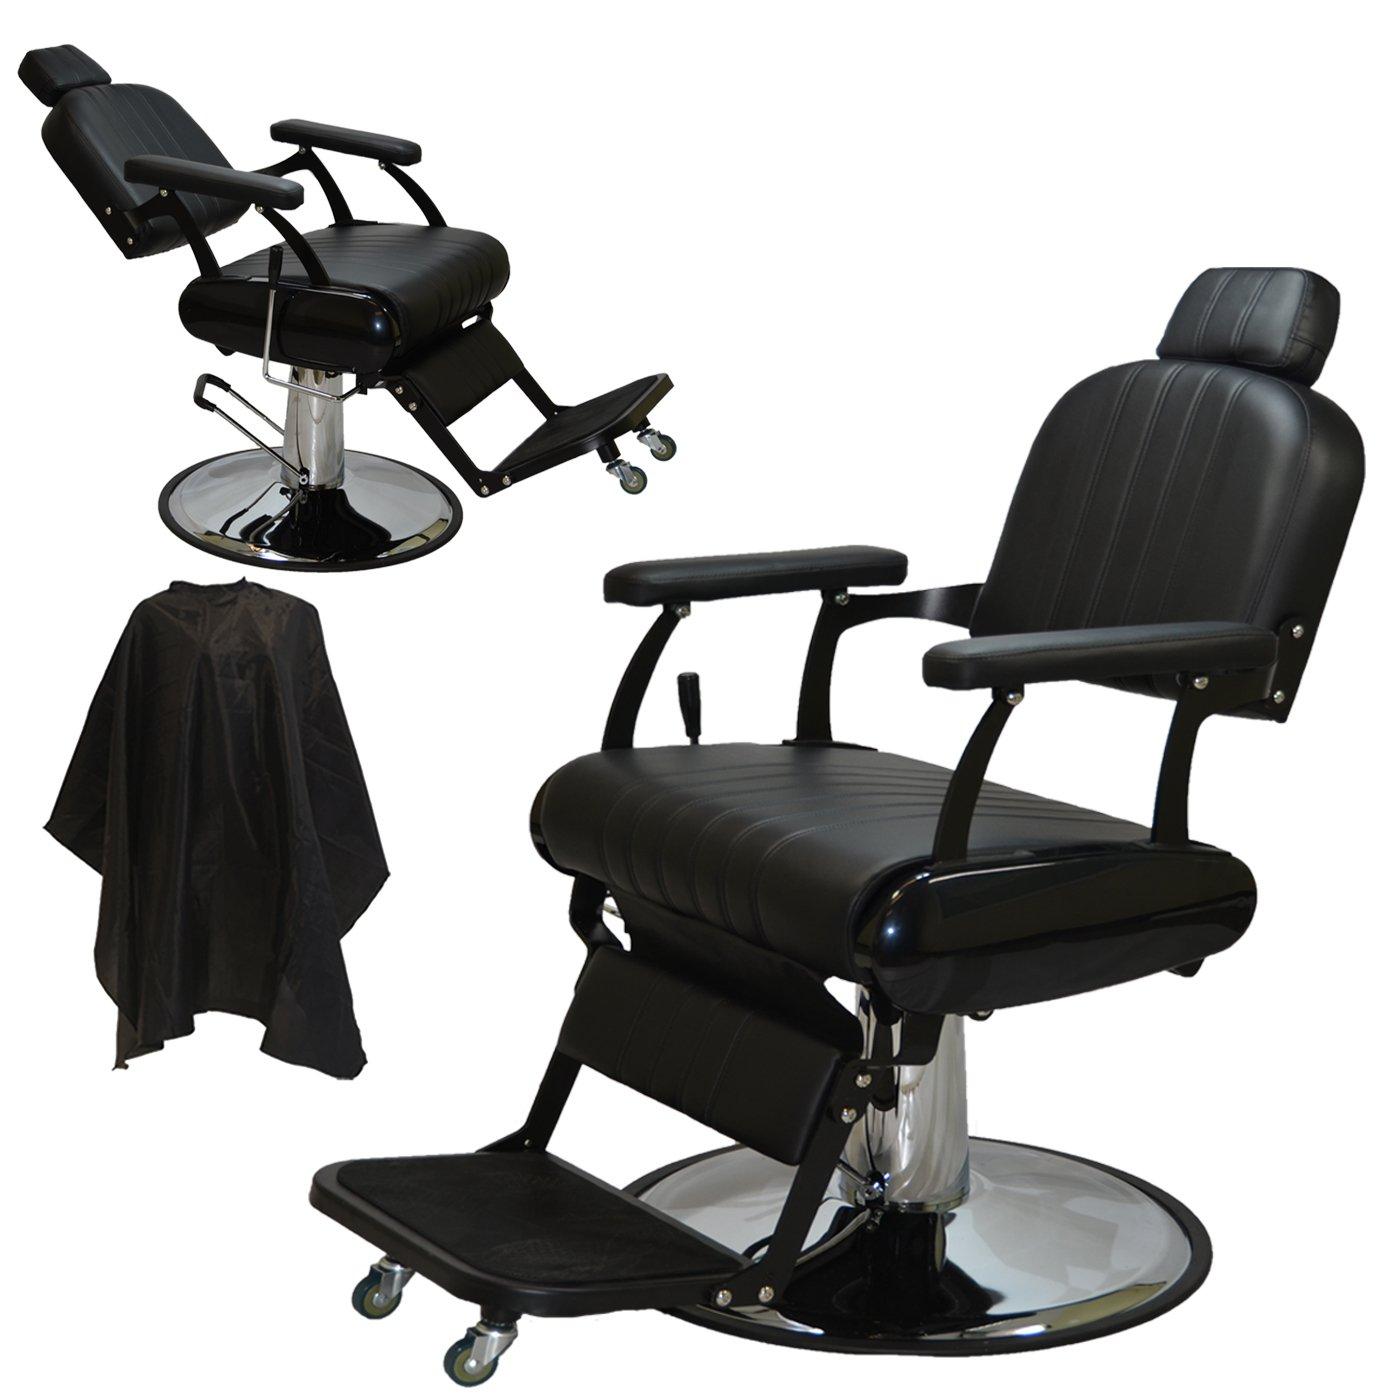 15 Best Hydraulic Barber Chairs 2017 2018 on Flipboard